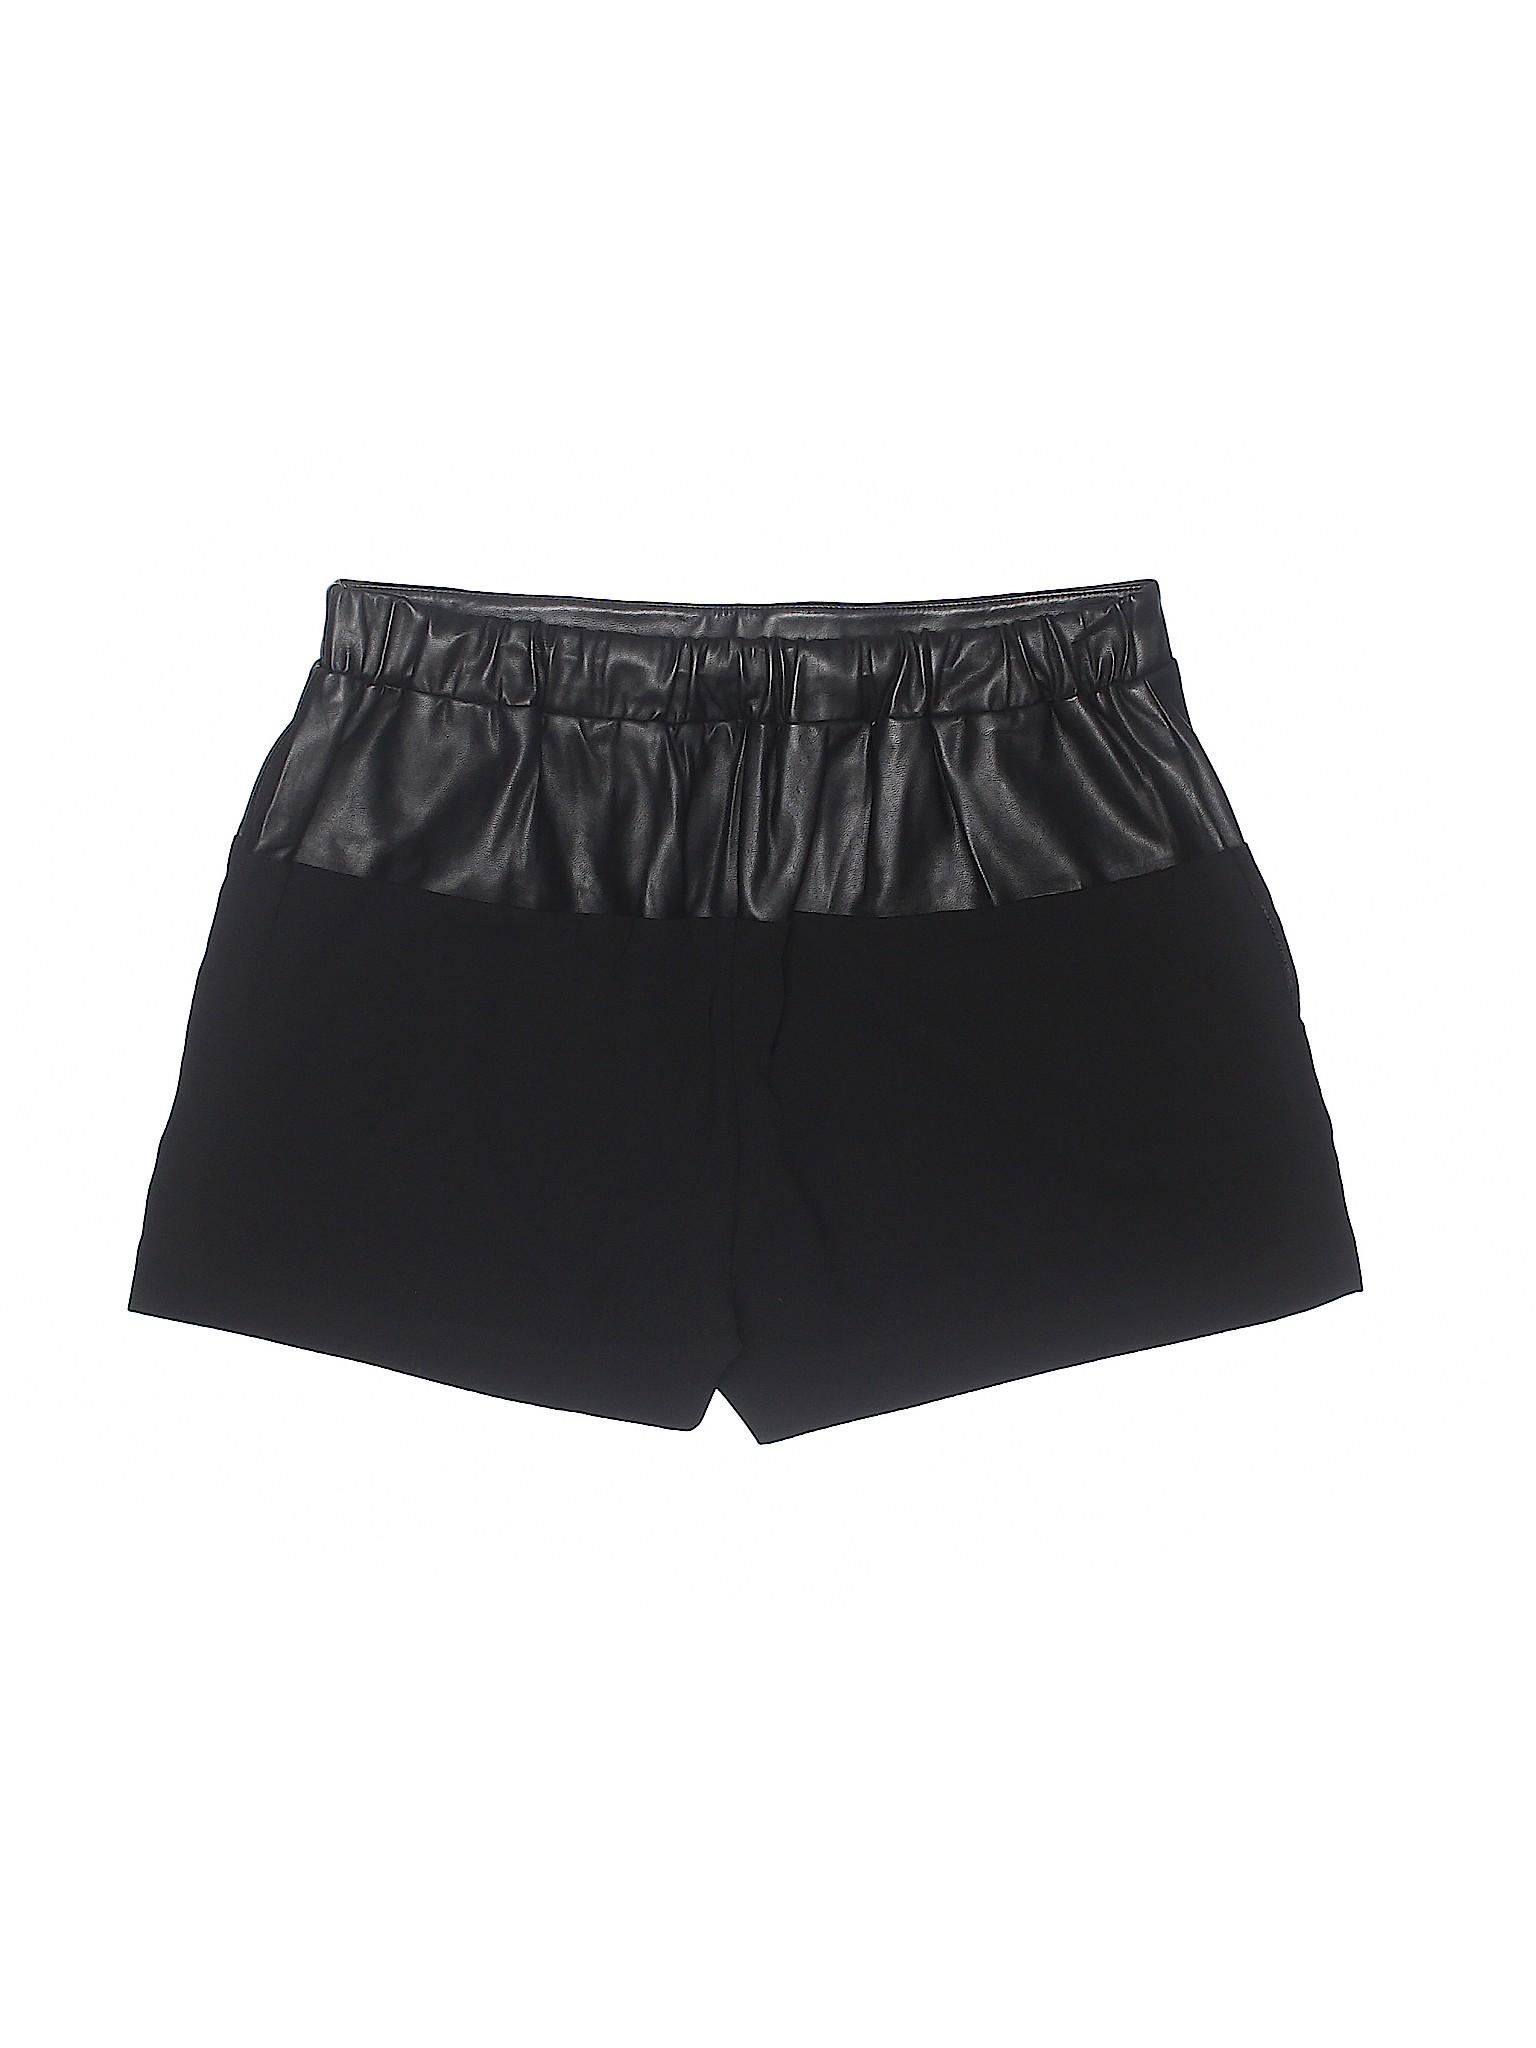 Shorts Boutique Forever Athletic Forever 21 Boutique OSxOqX